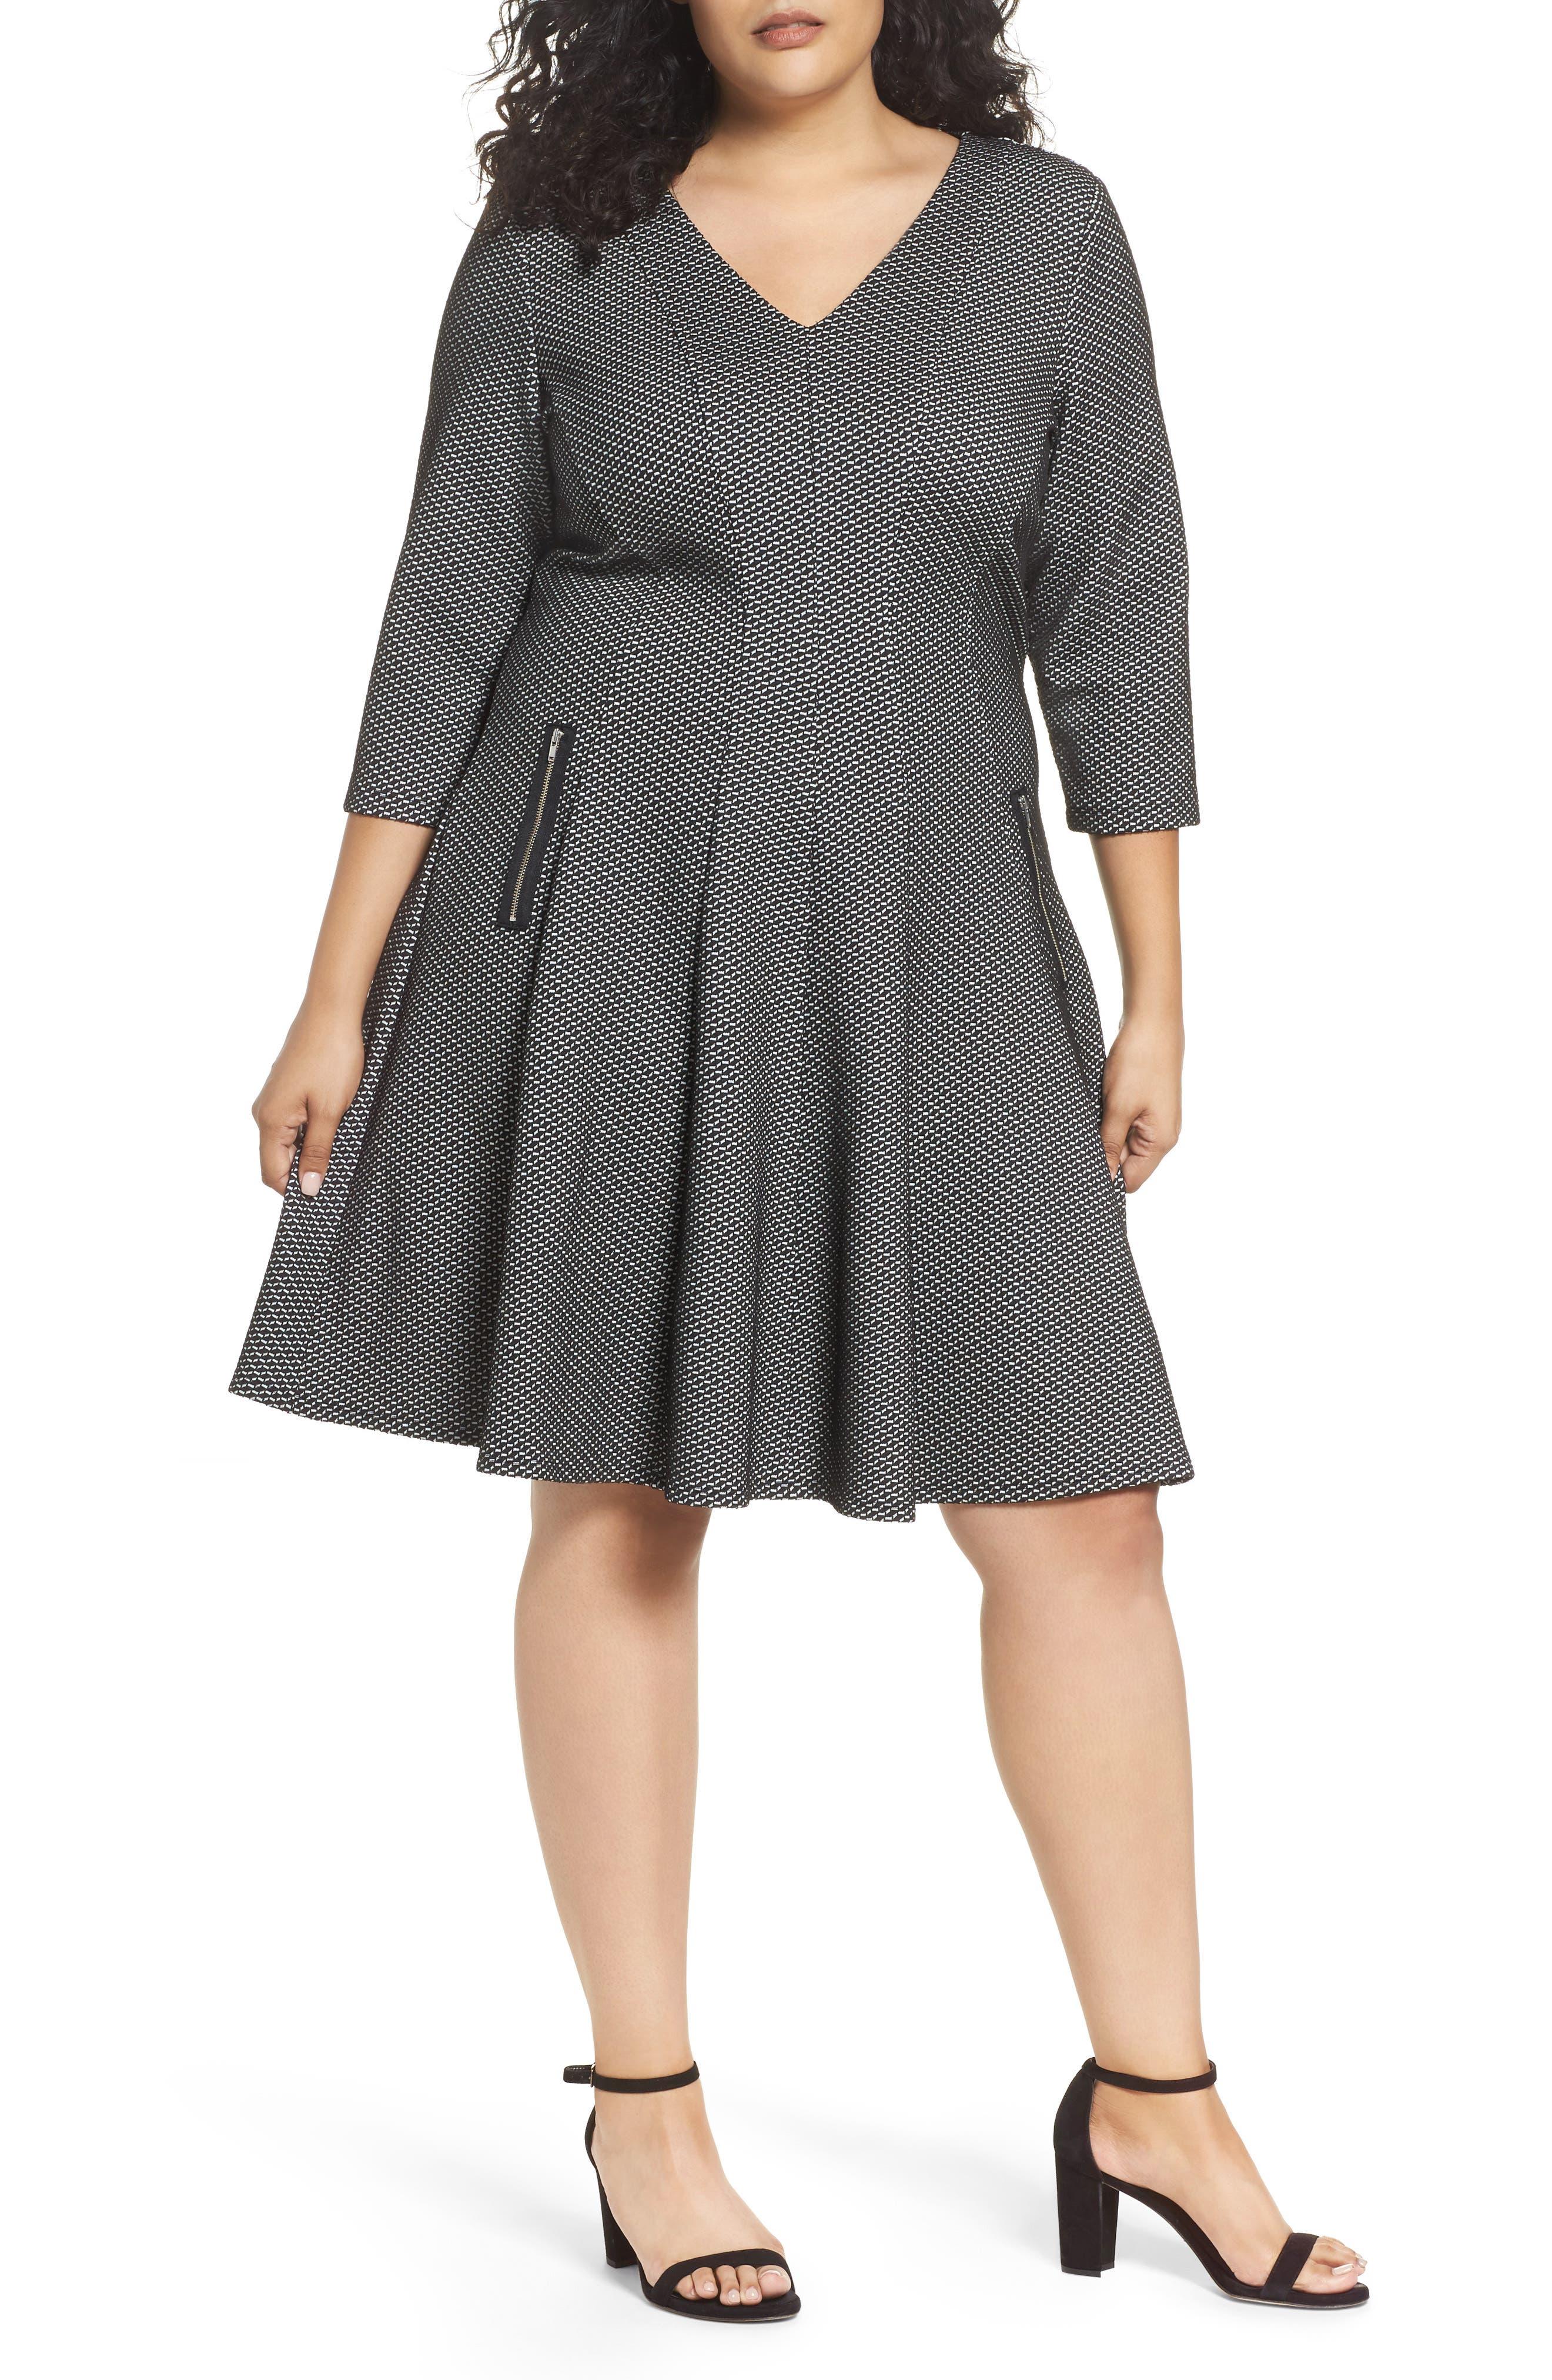 Main Image - Gabby Skye Jacquard Fit & Flare Dress (Plus Size)